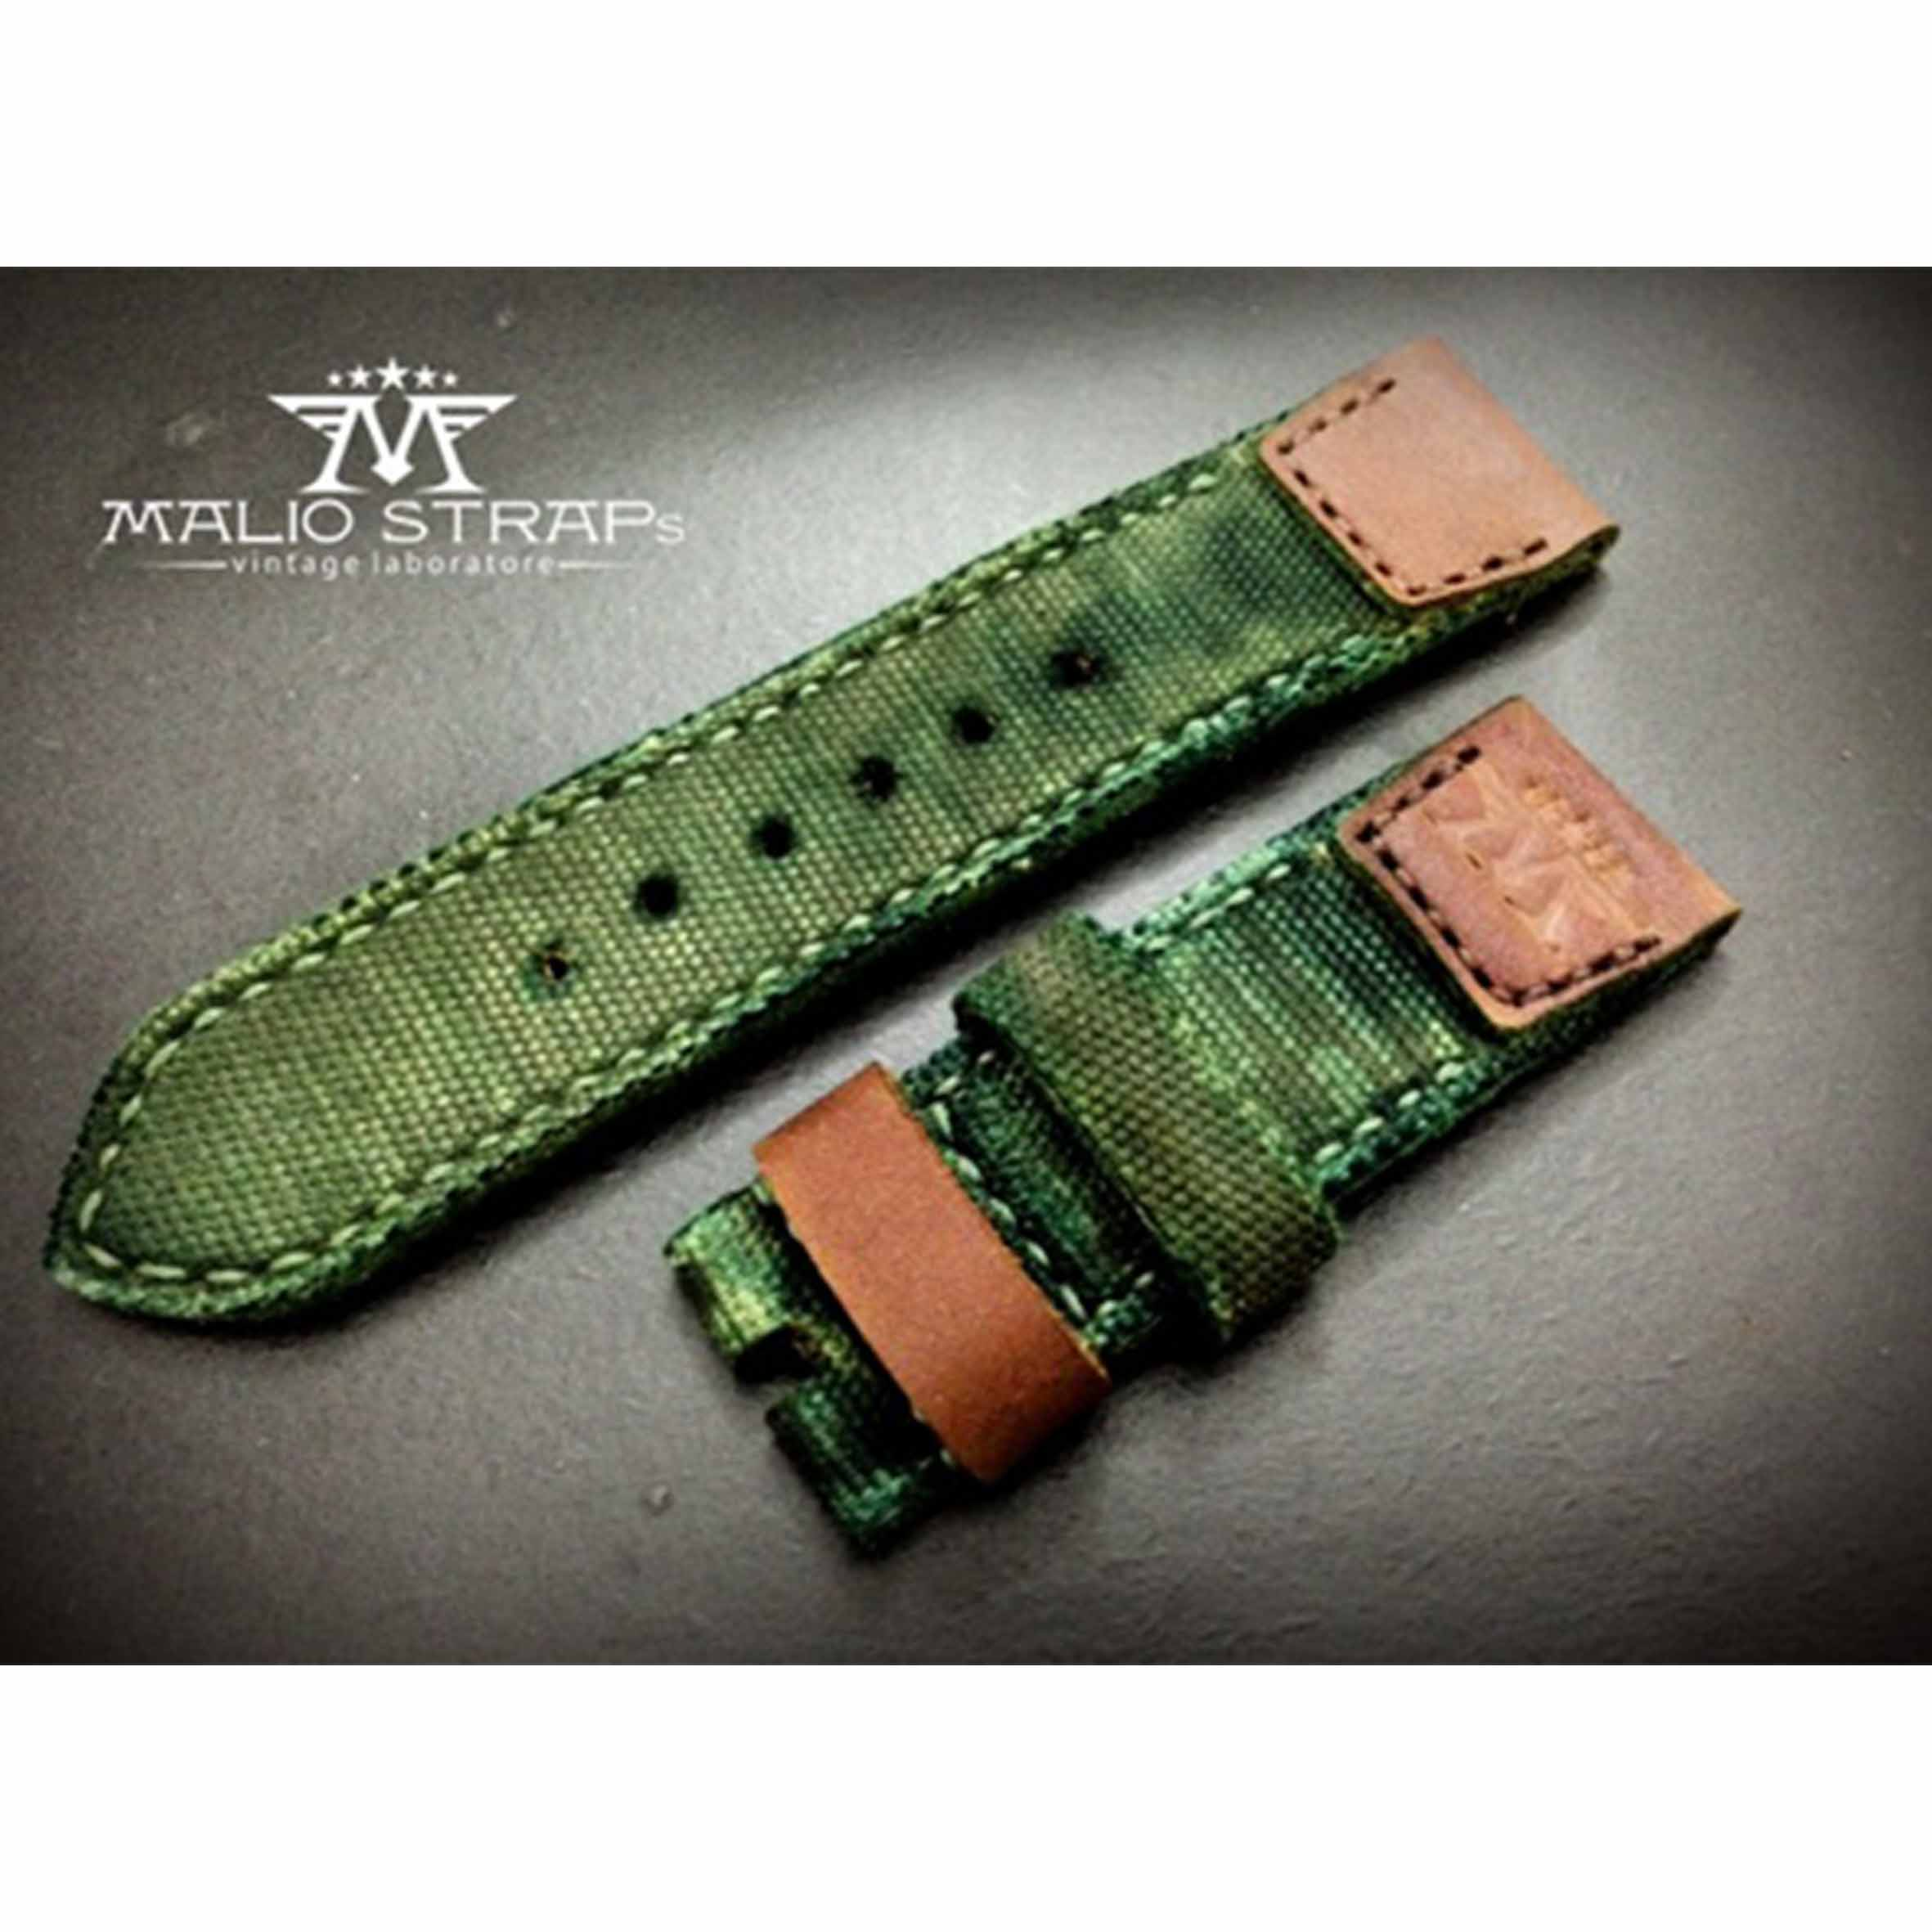 malio-straps-combat-canvas-1-strapsonly (1)